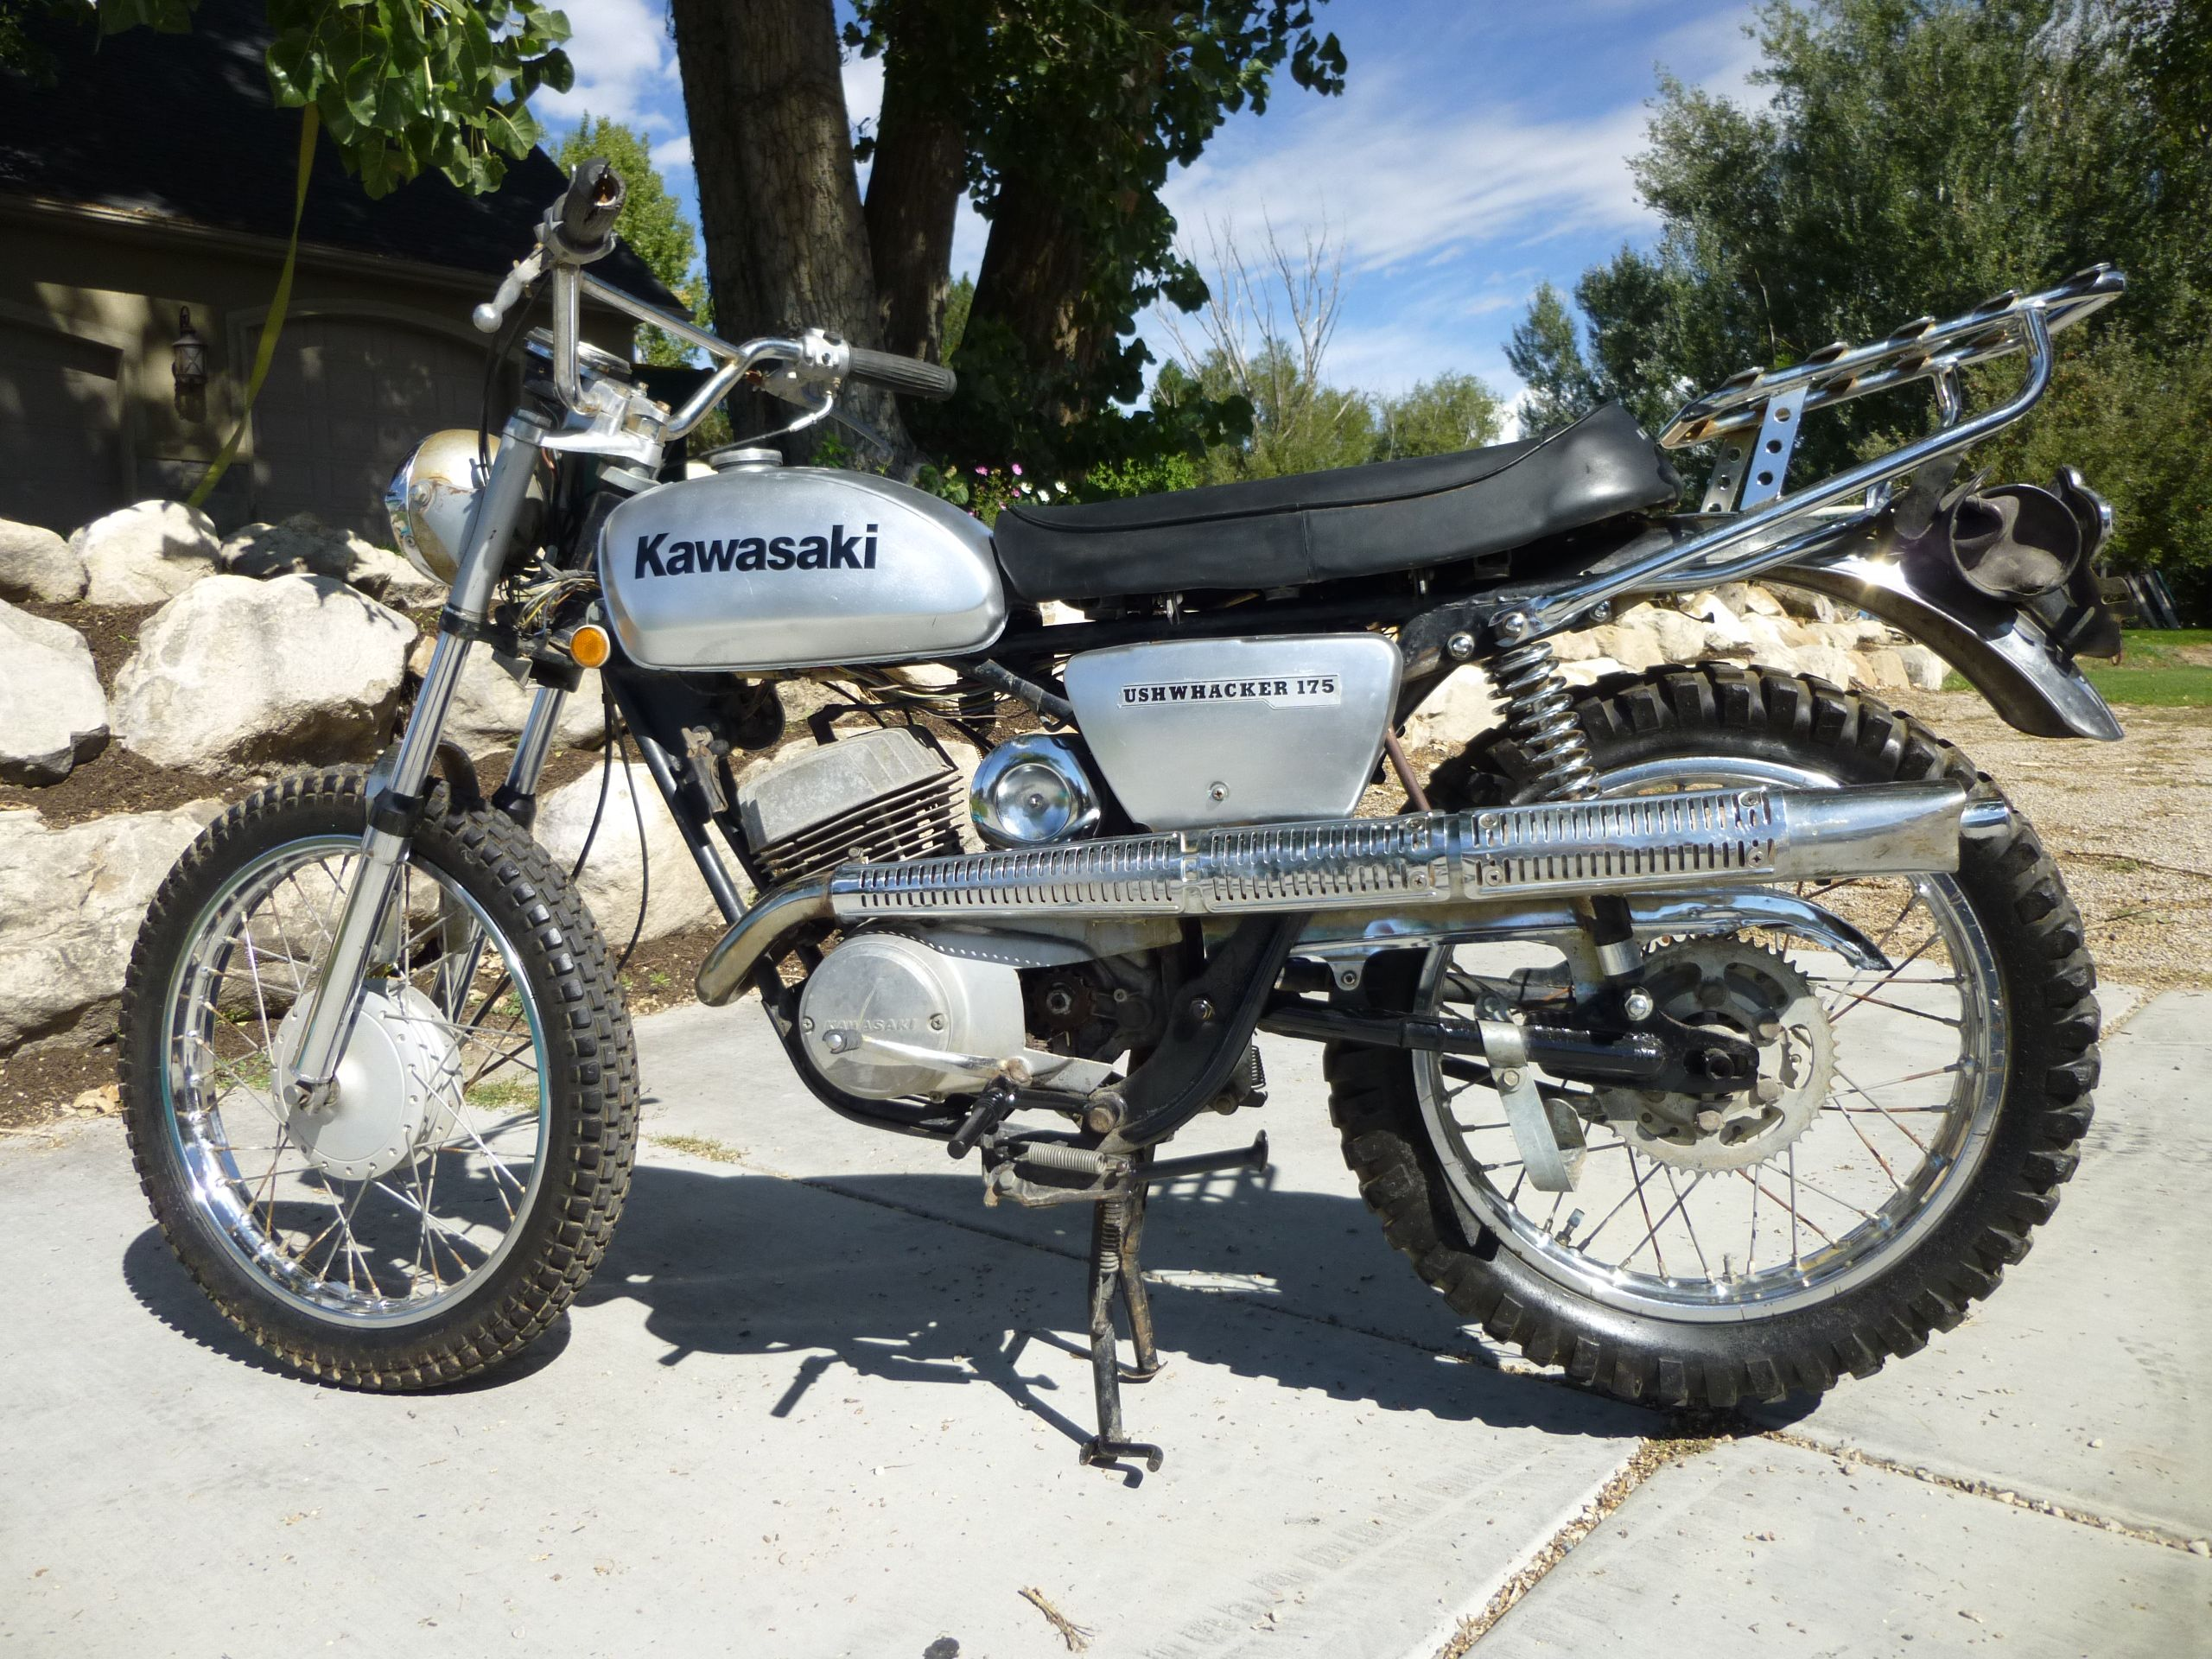 69 Kawasaki Bushwacker 175 | vintage bikes | Kawasaki